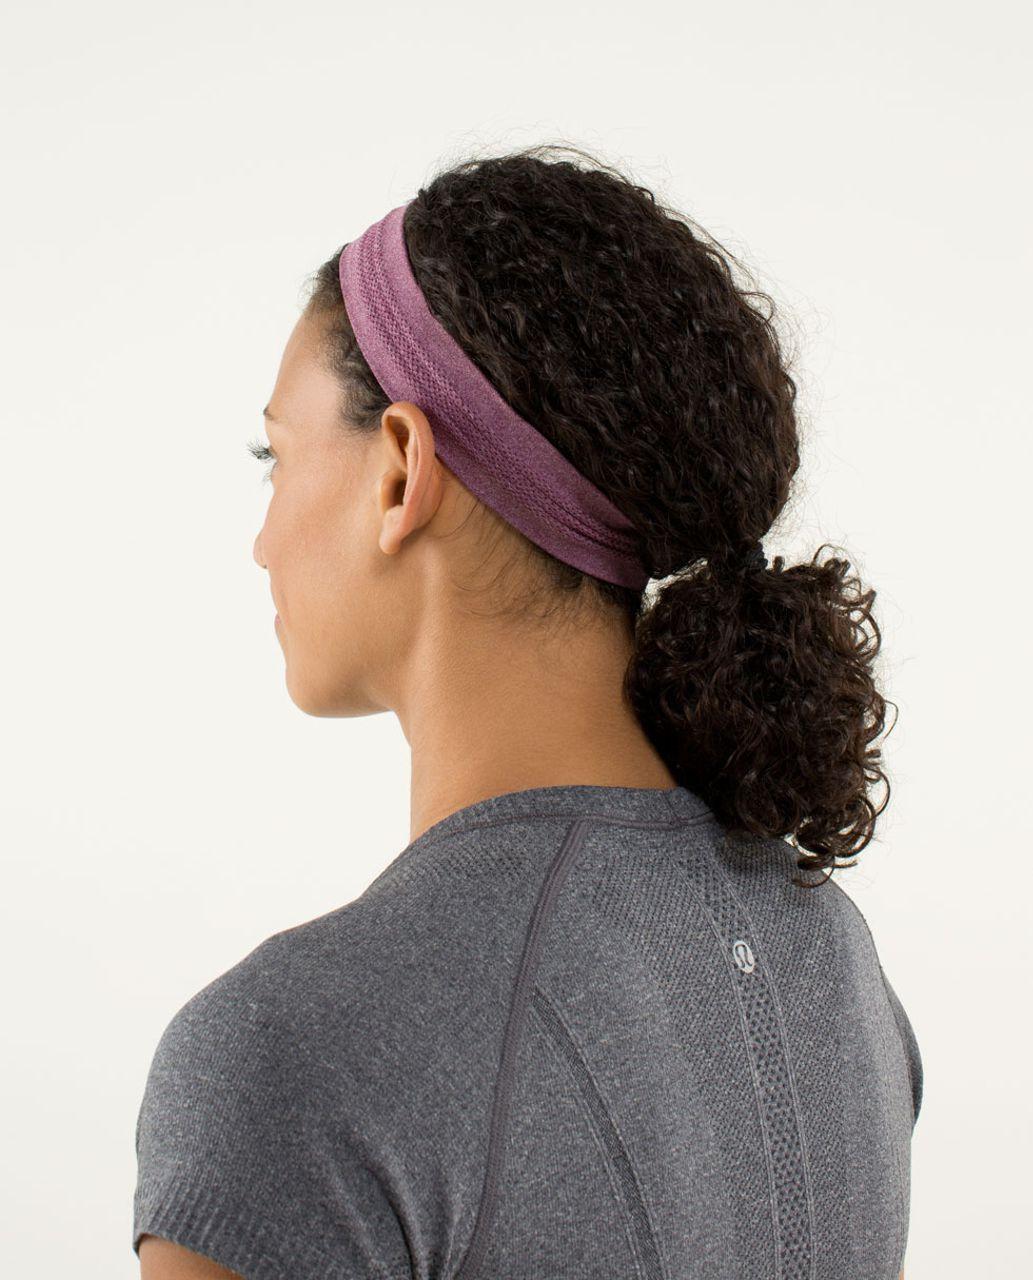 3a2863dc45049 Lululemon Swiftly Headband - Heathered Plum - lulu fanatics